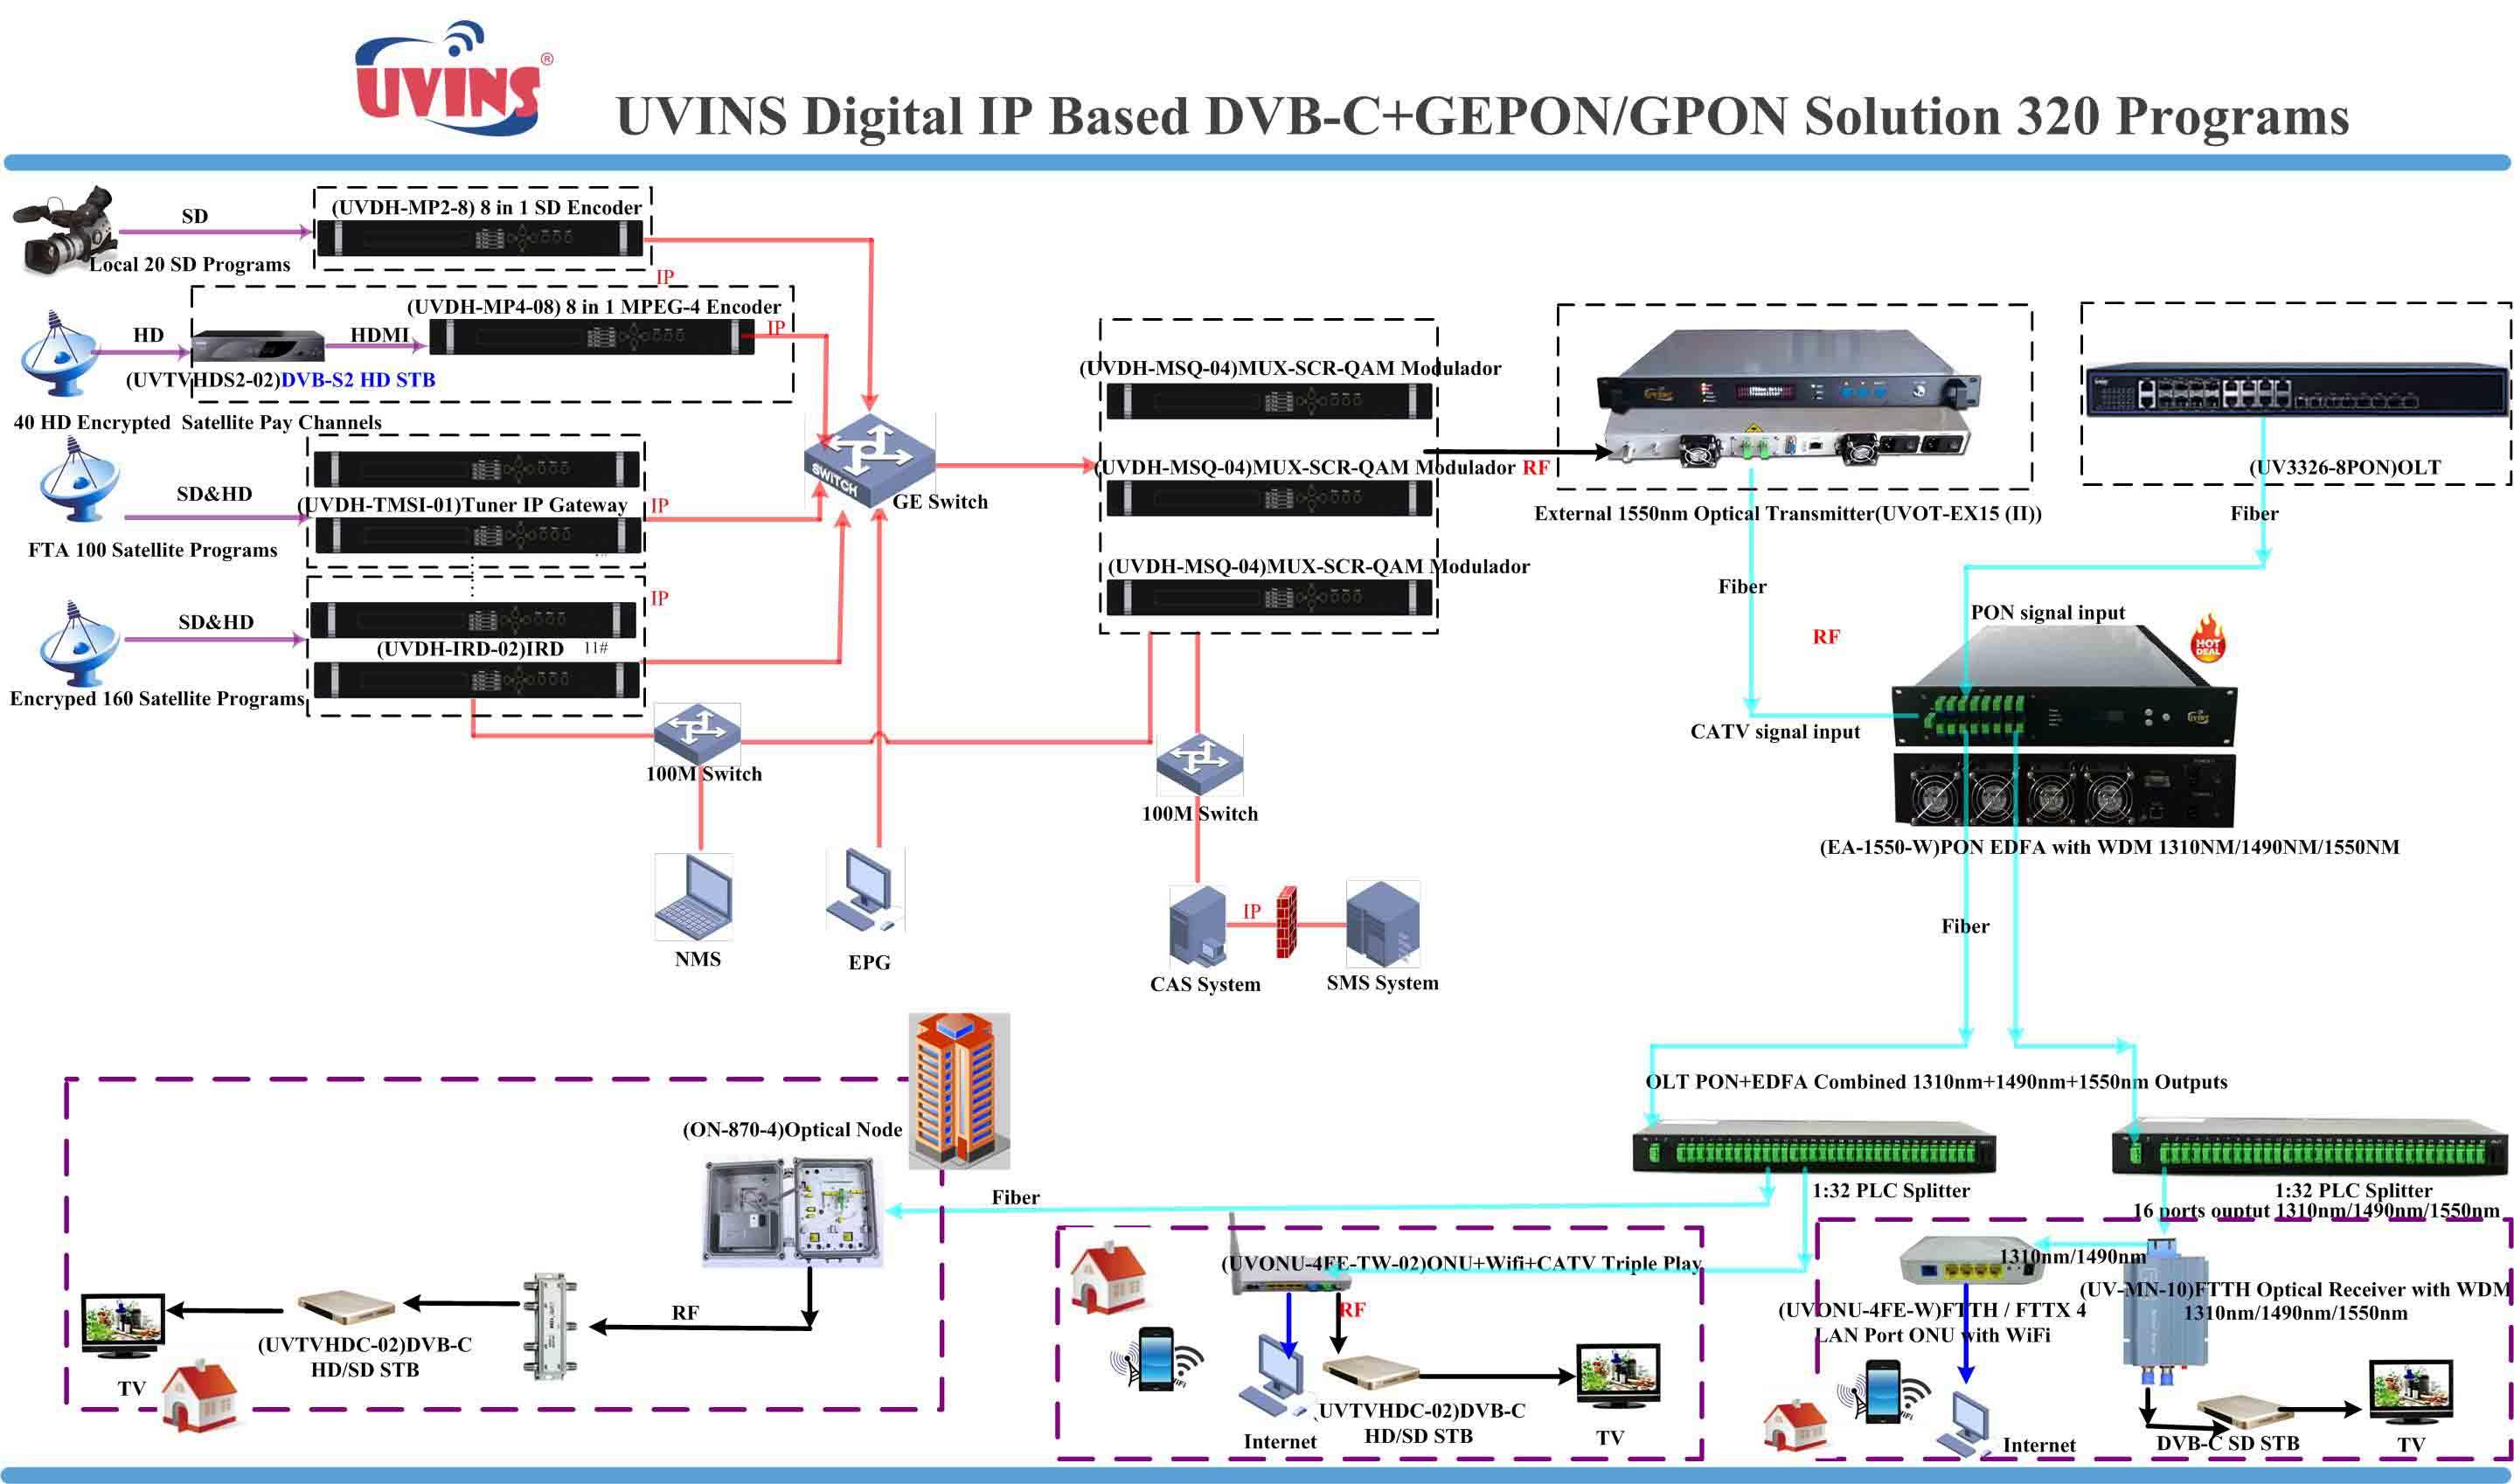 DVB-C IP Based DVB-C+GEPON Solution 320 programs